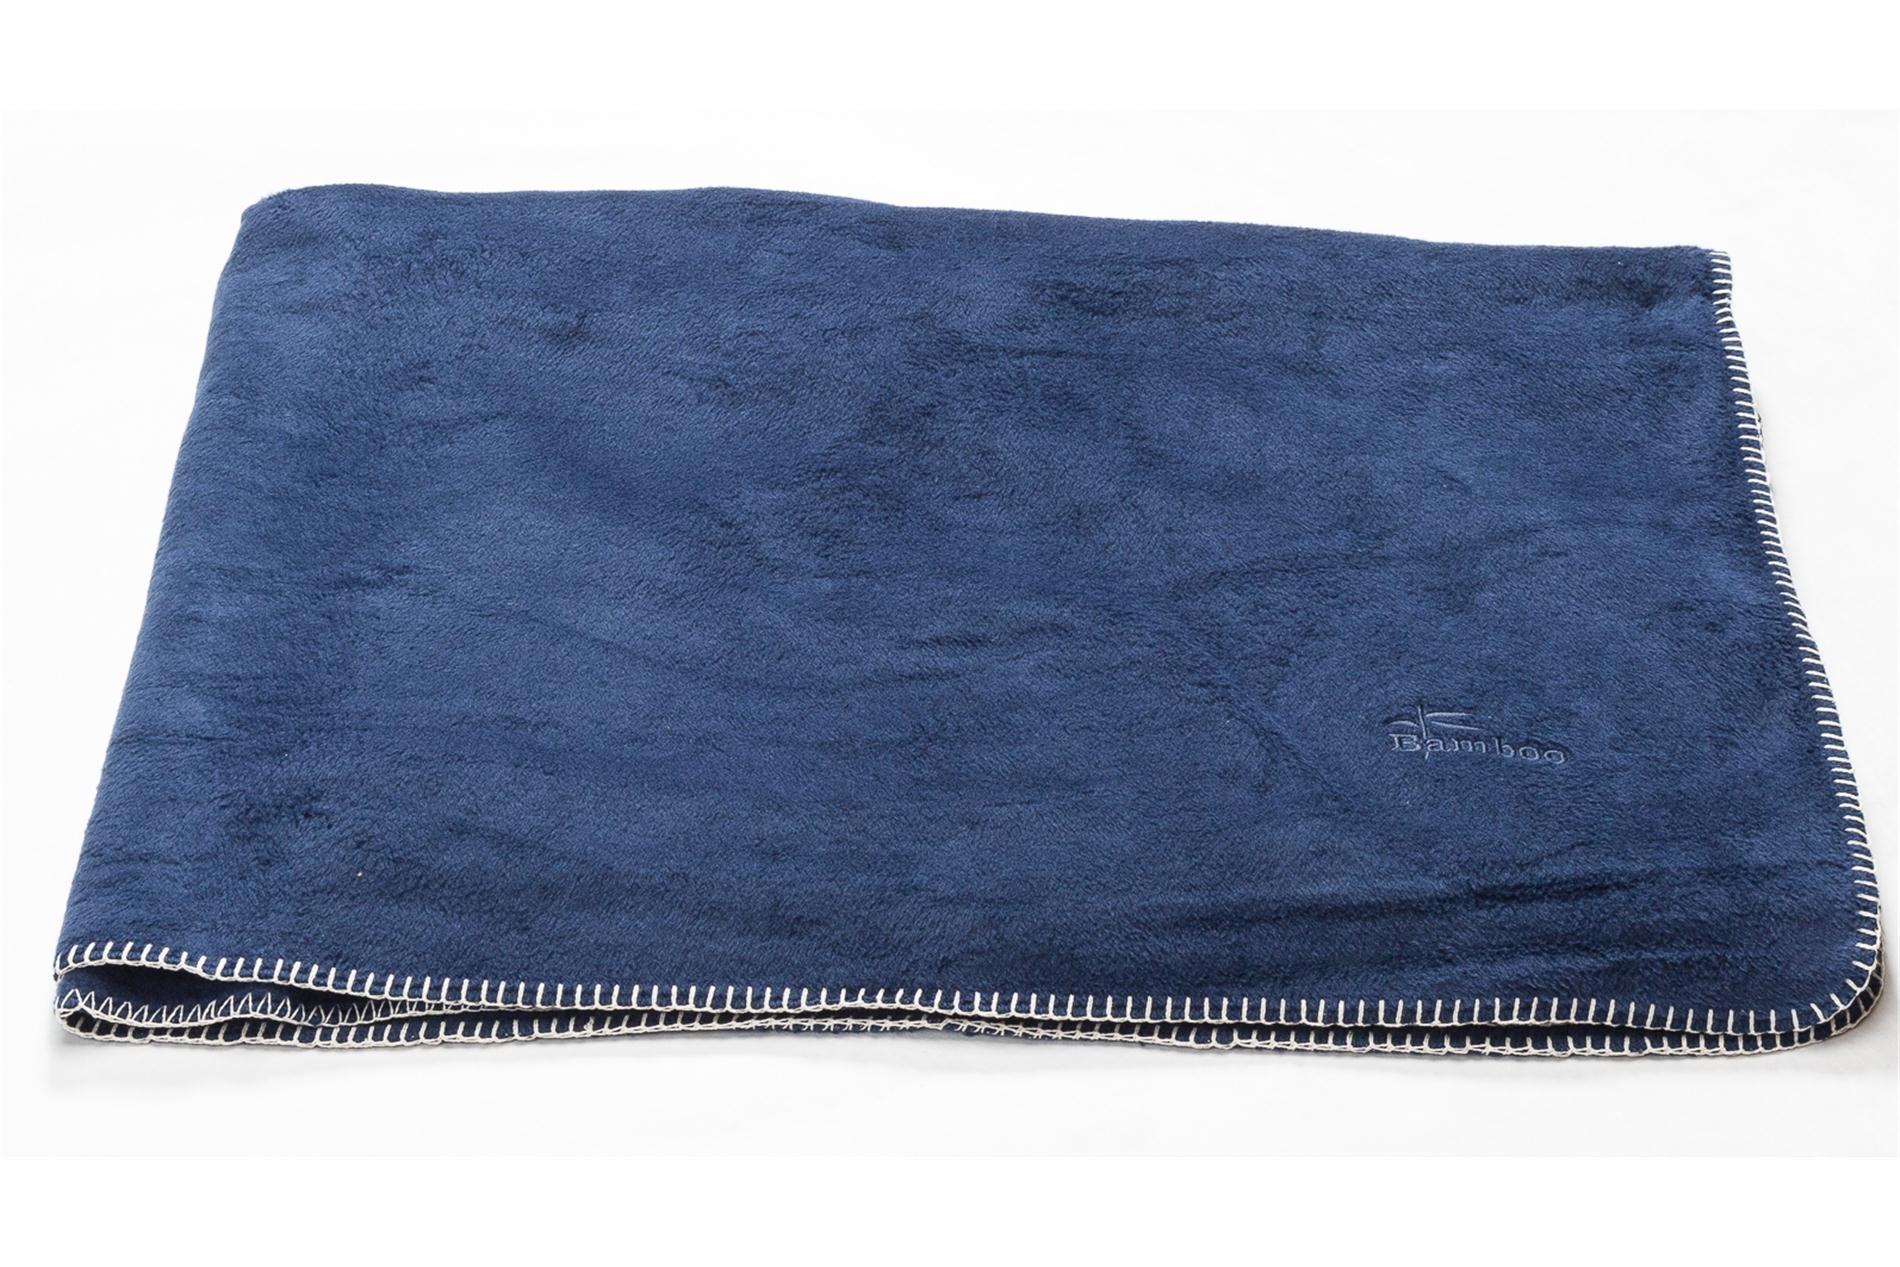 DAVID FUSSENEGGER Decke Bamboo blau 150x200 cm